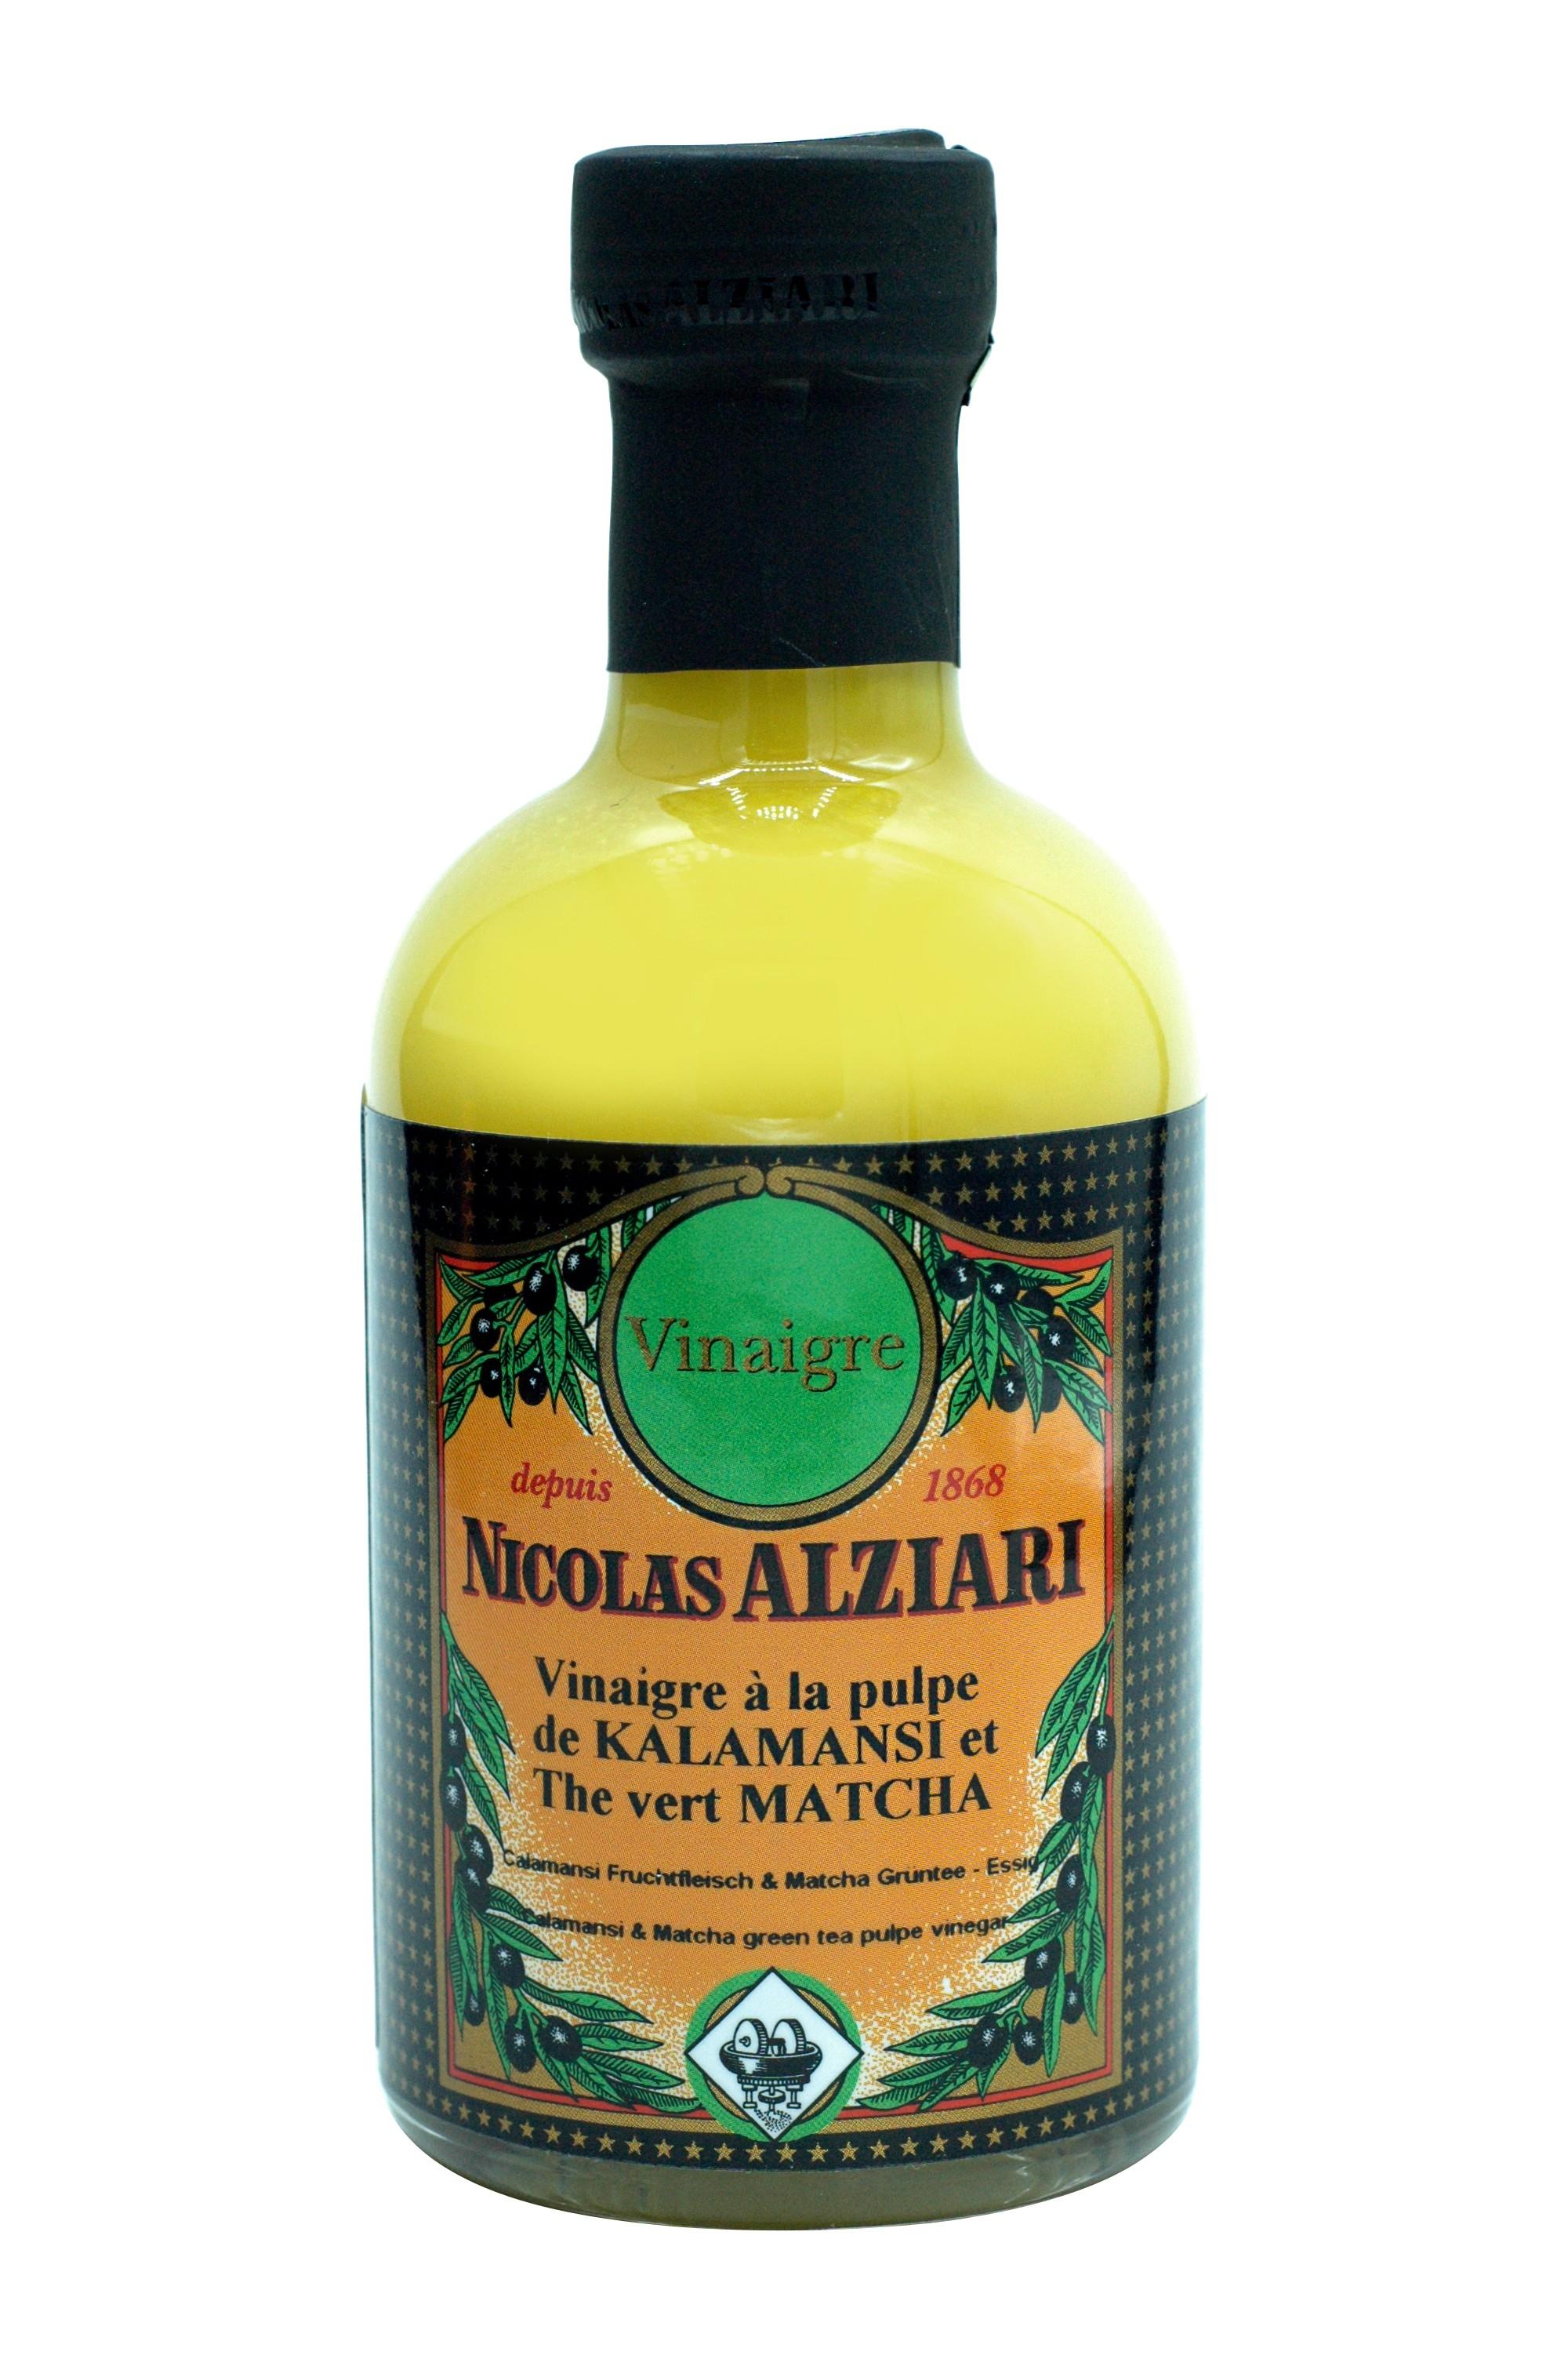 200 ml bottle Calamansi & Matcha green tea pulpe vinegar